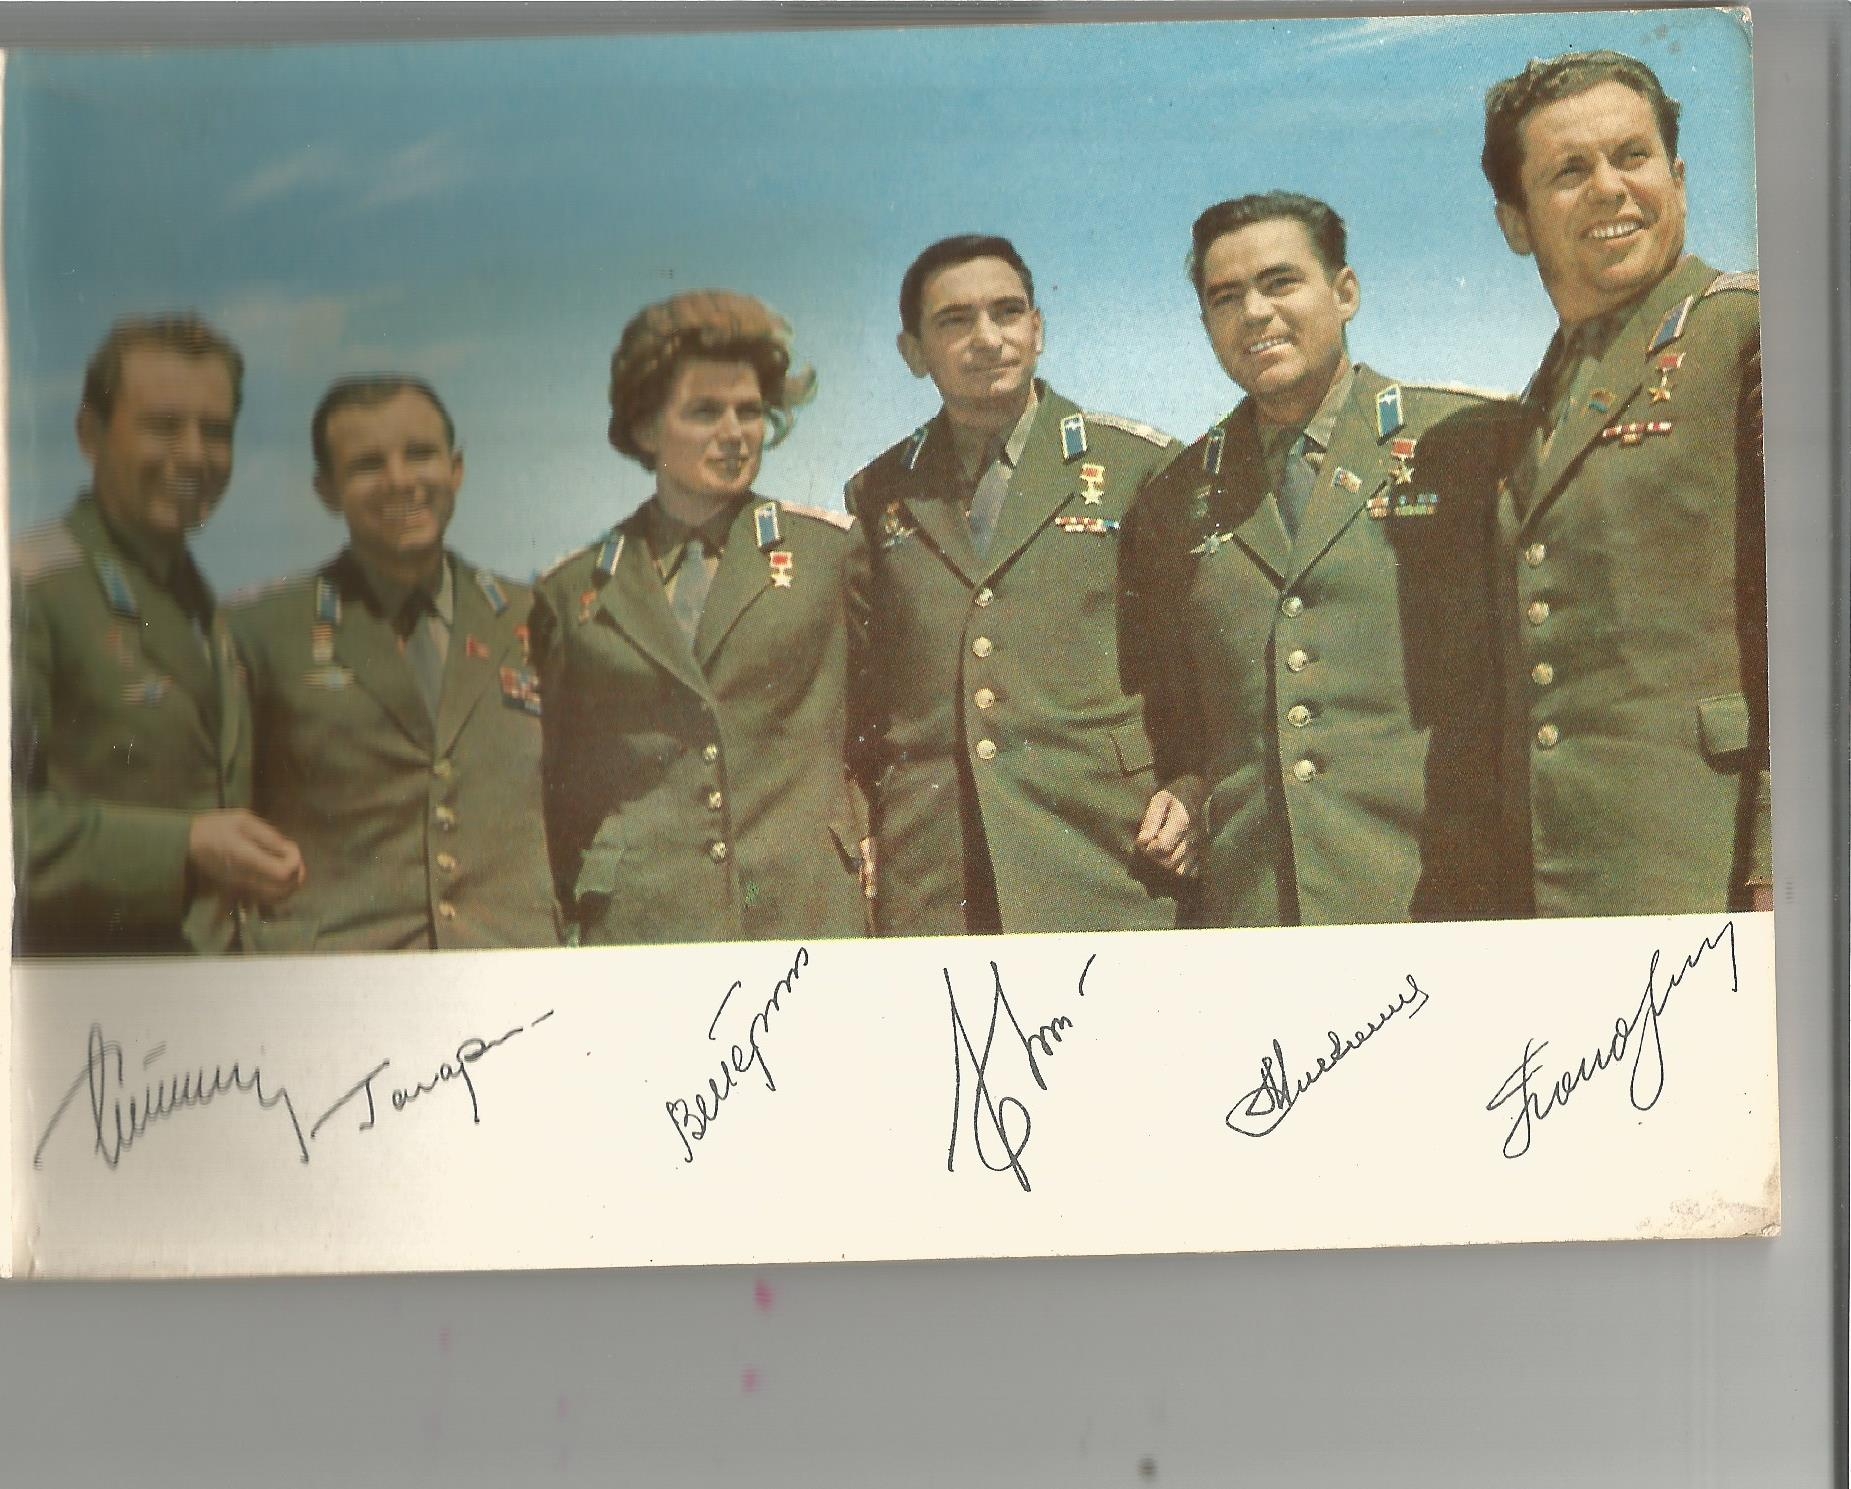 Valery Bykovsky signed Vintage Russian Cosmonauts picture postcard book. Bykovsky was a Soviet